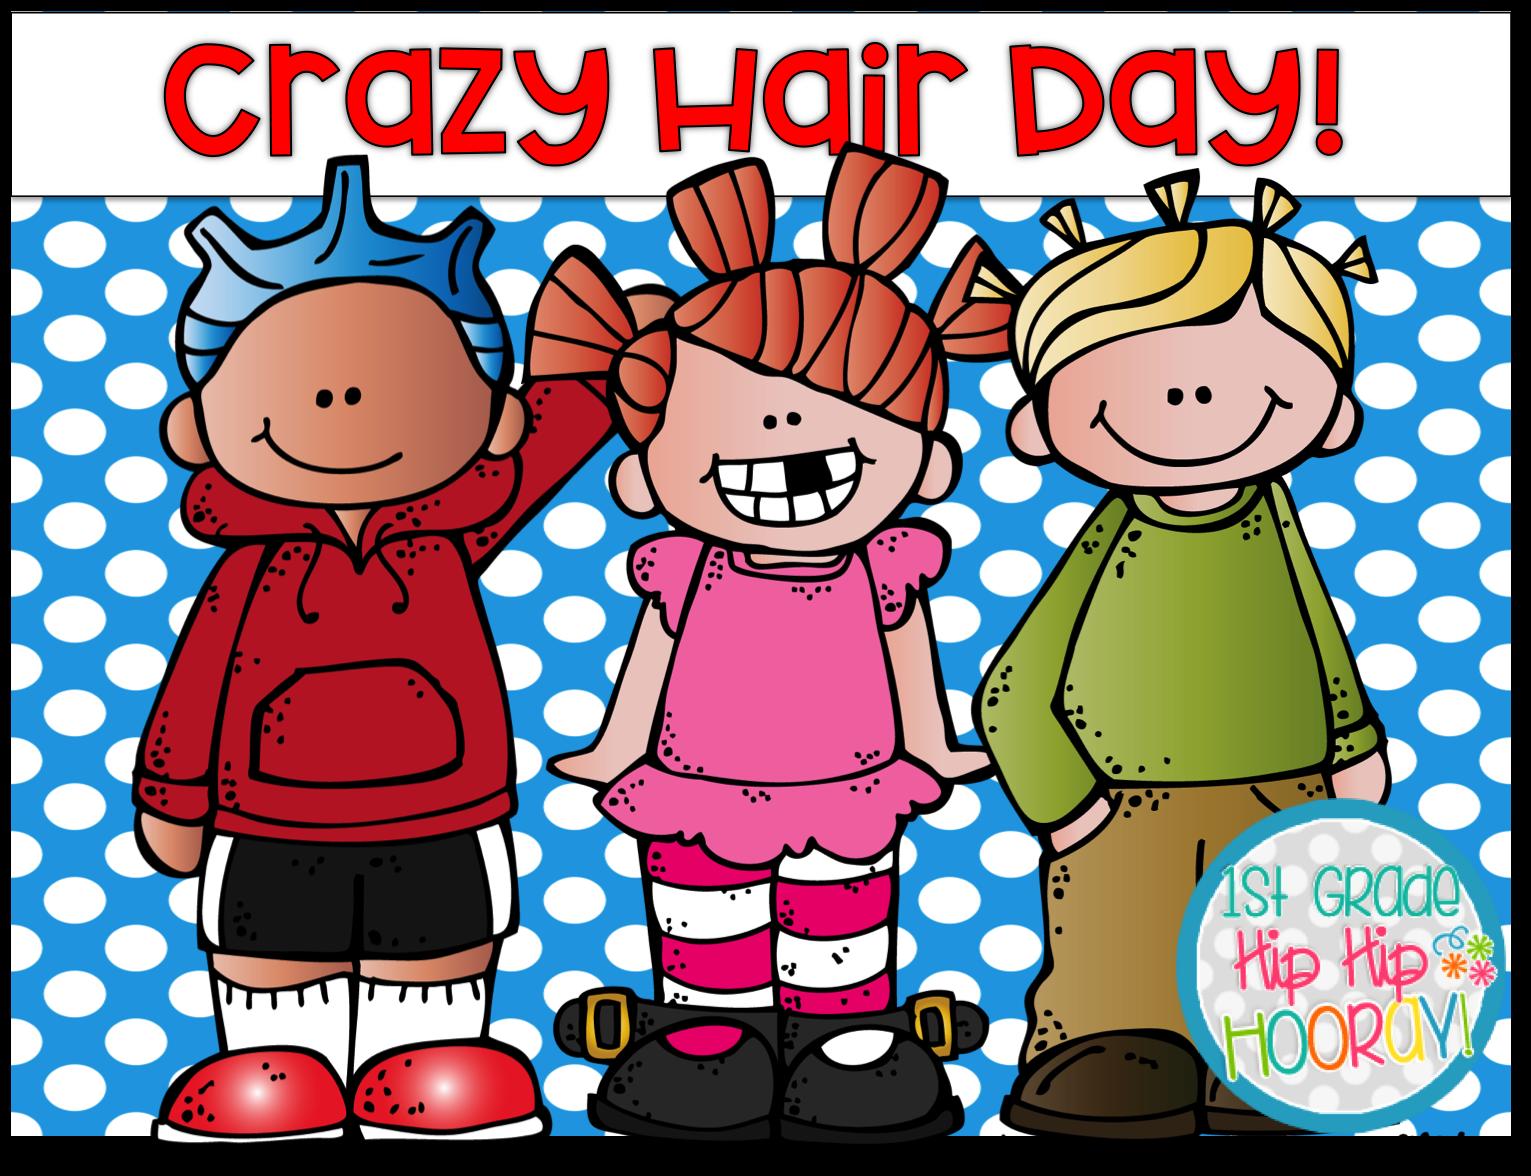 1st Grade Hip Hip Hooray Crazy Hair Day